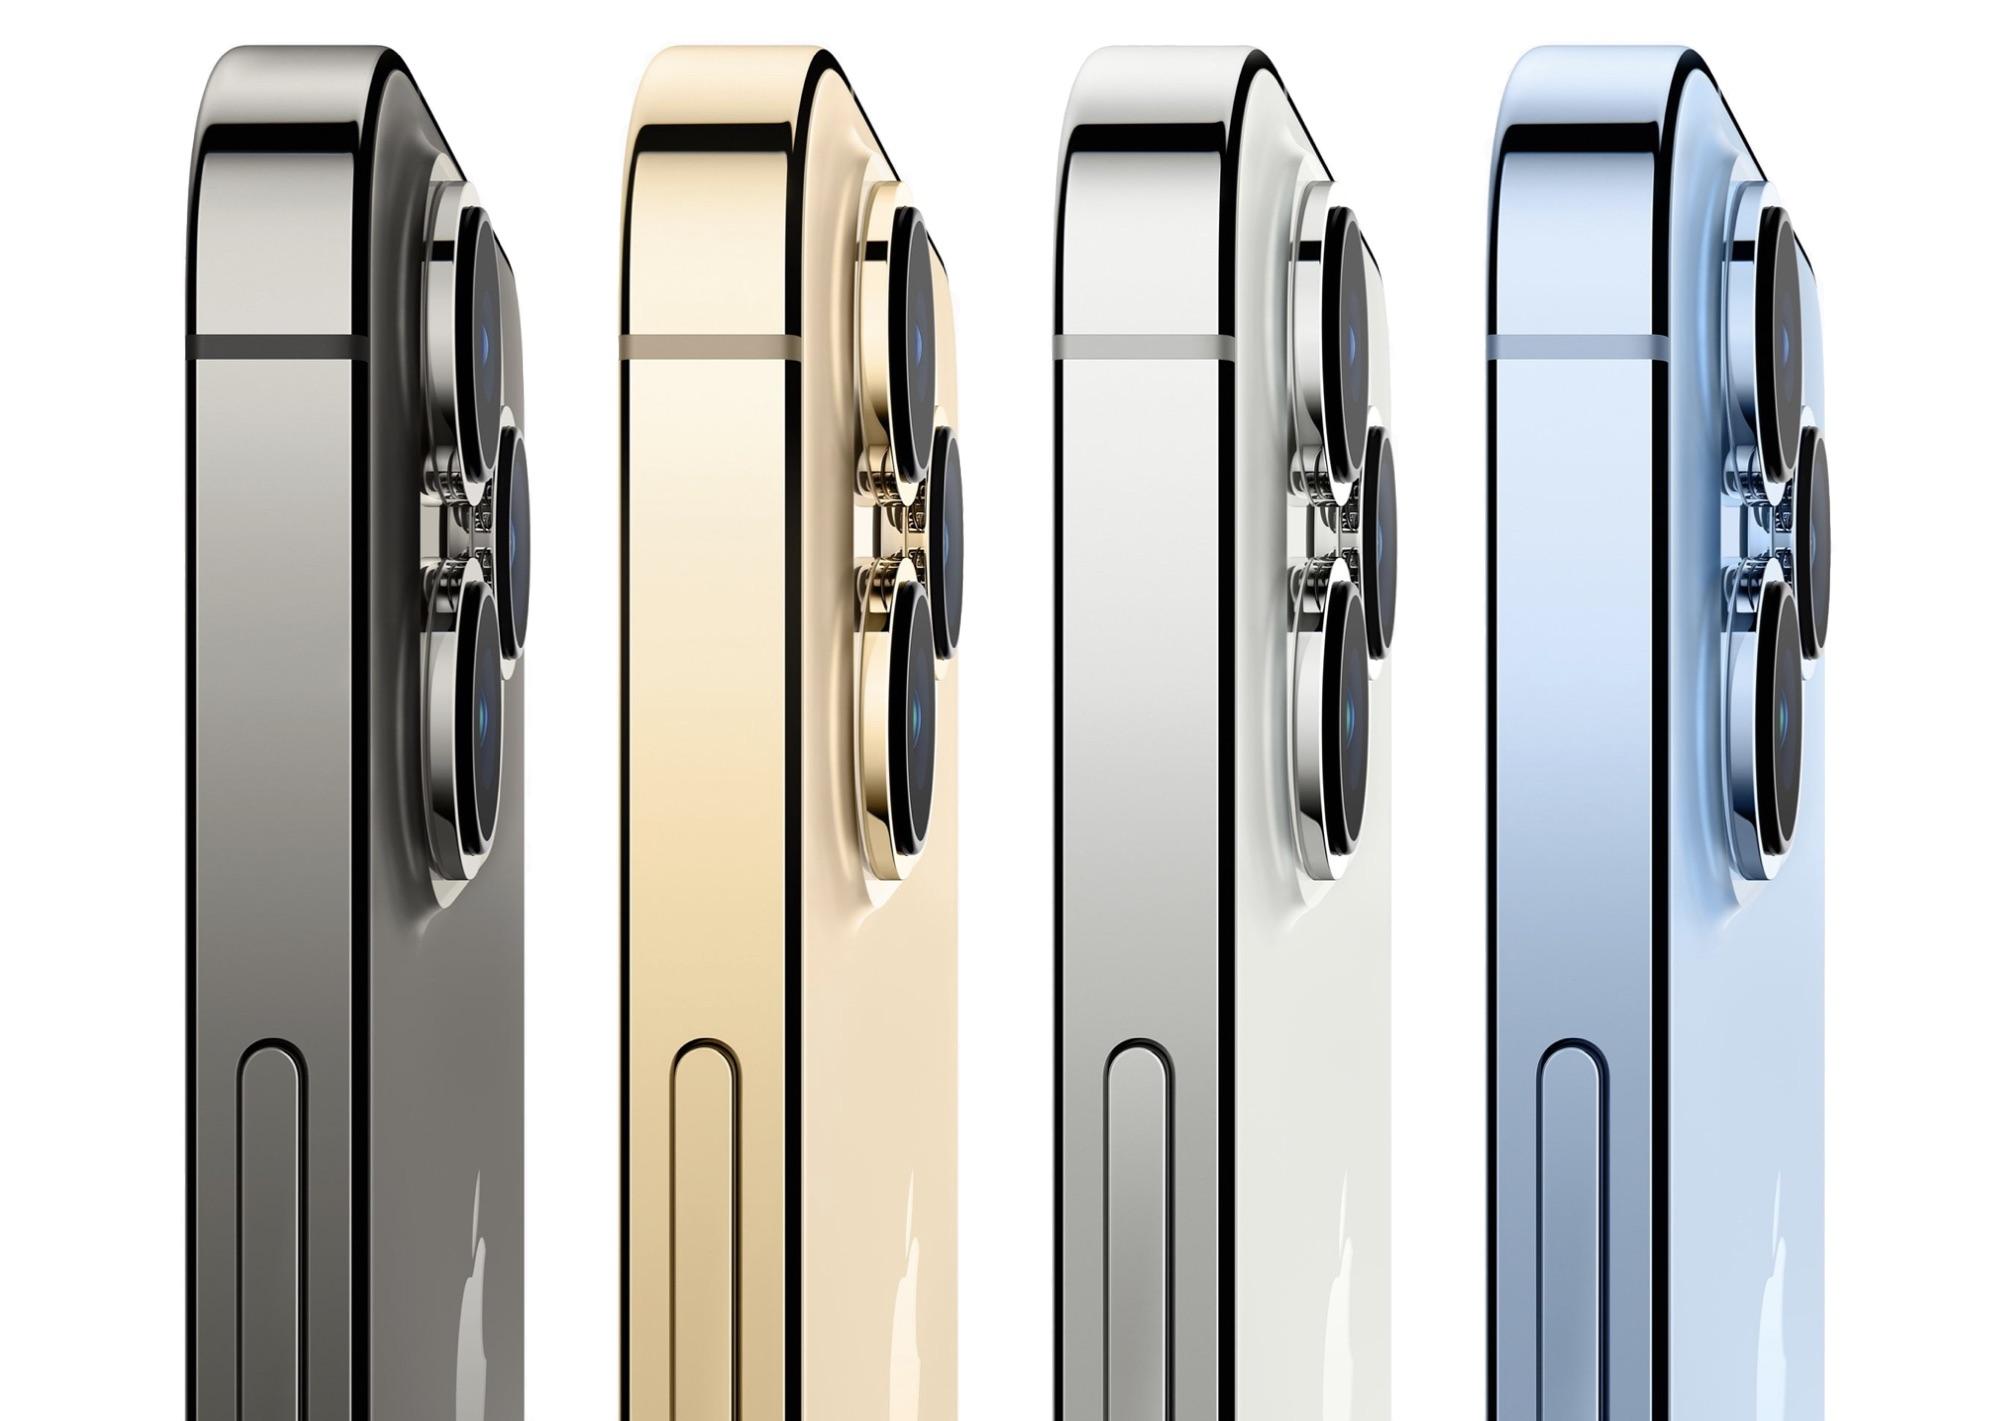 iphone 12 pro camera lineup